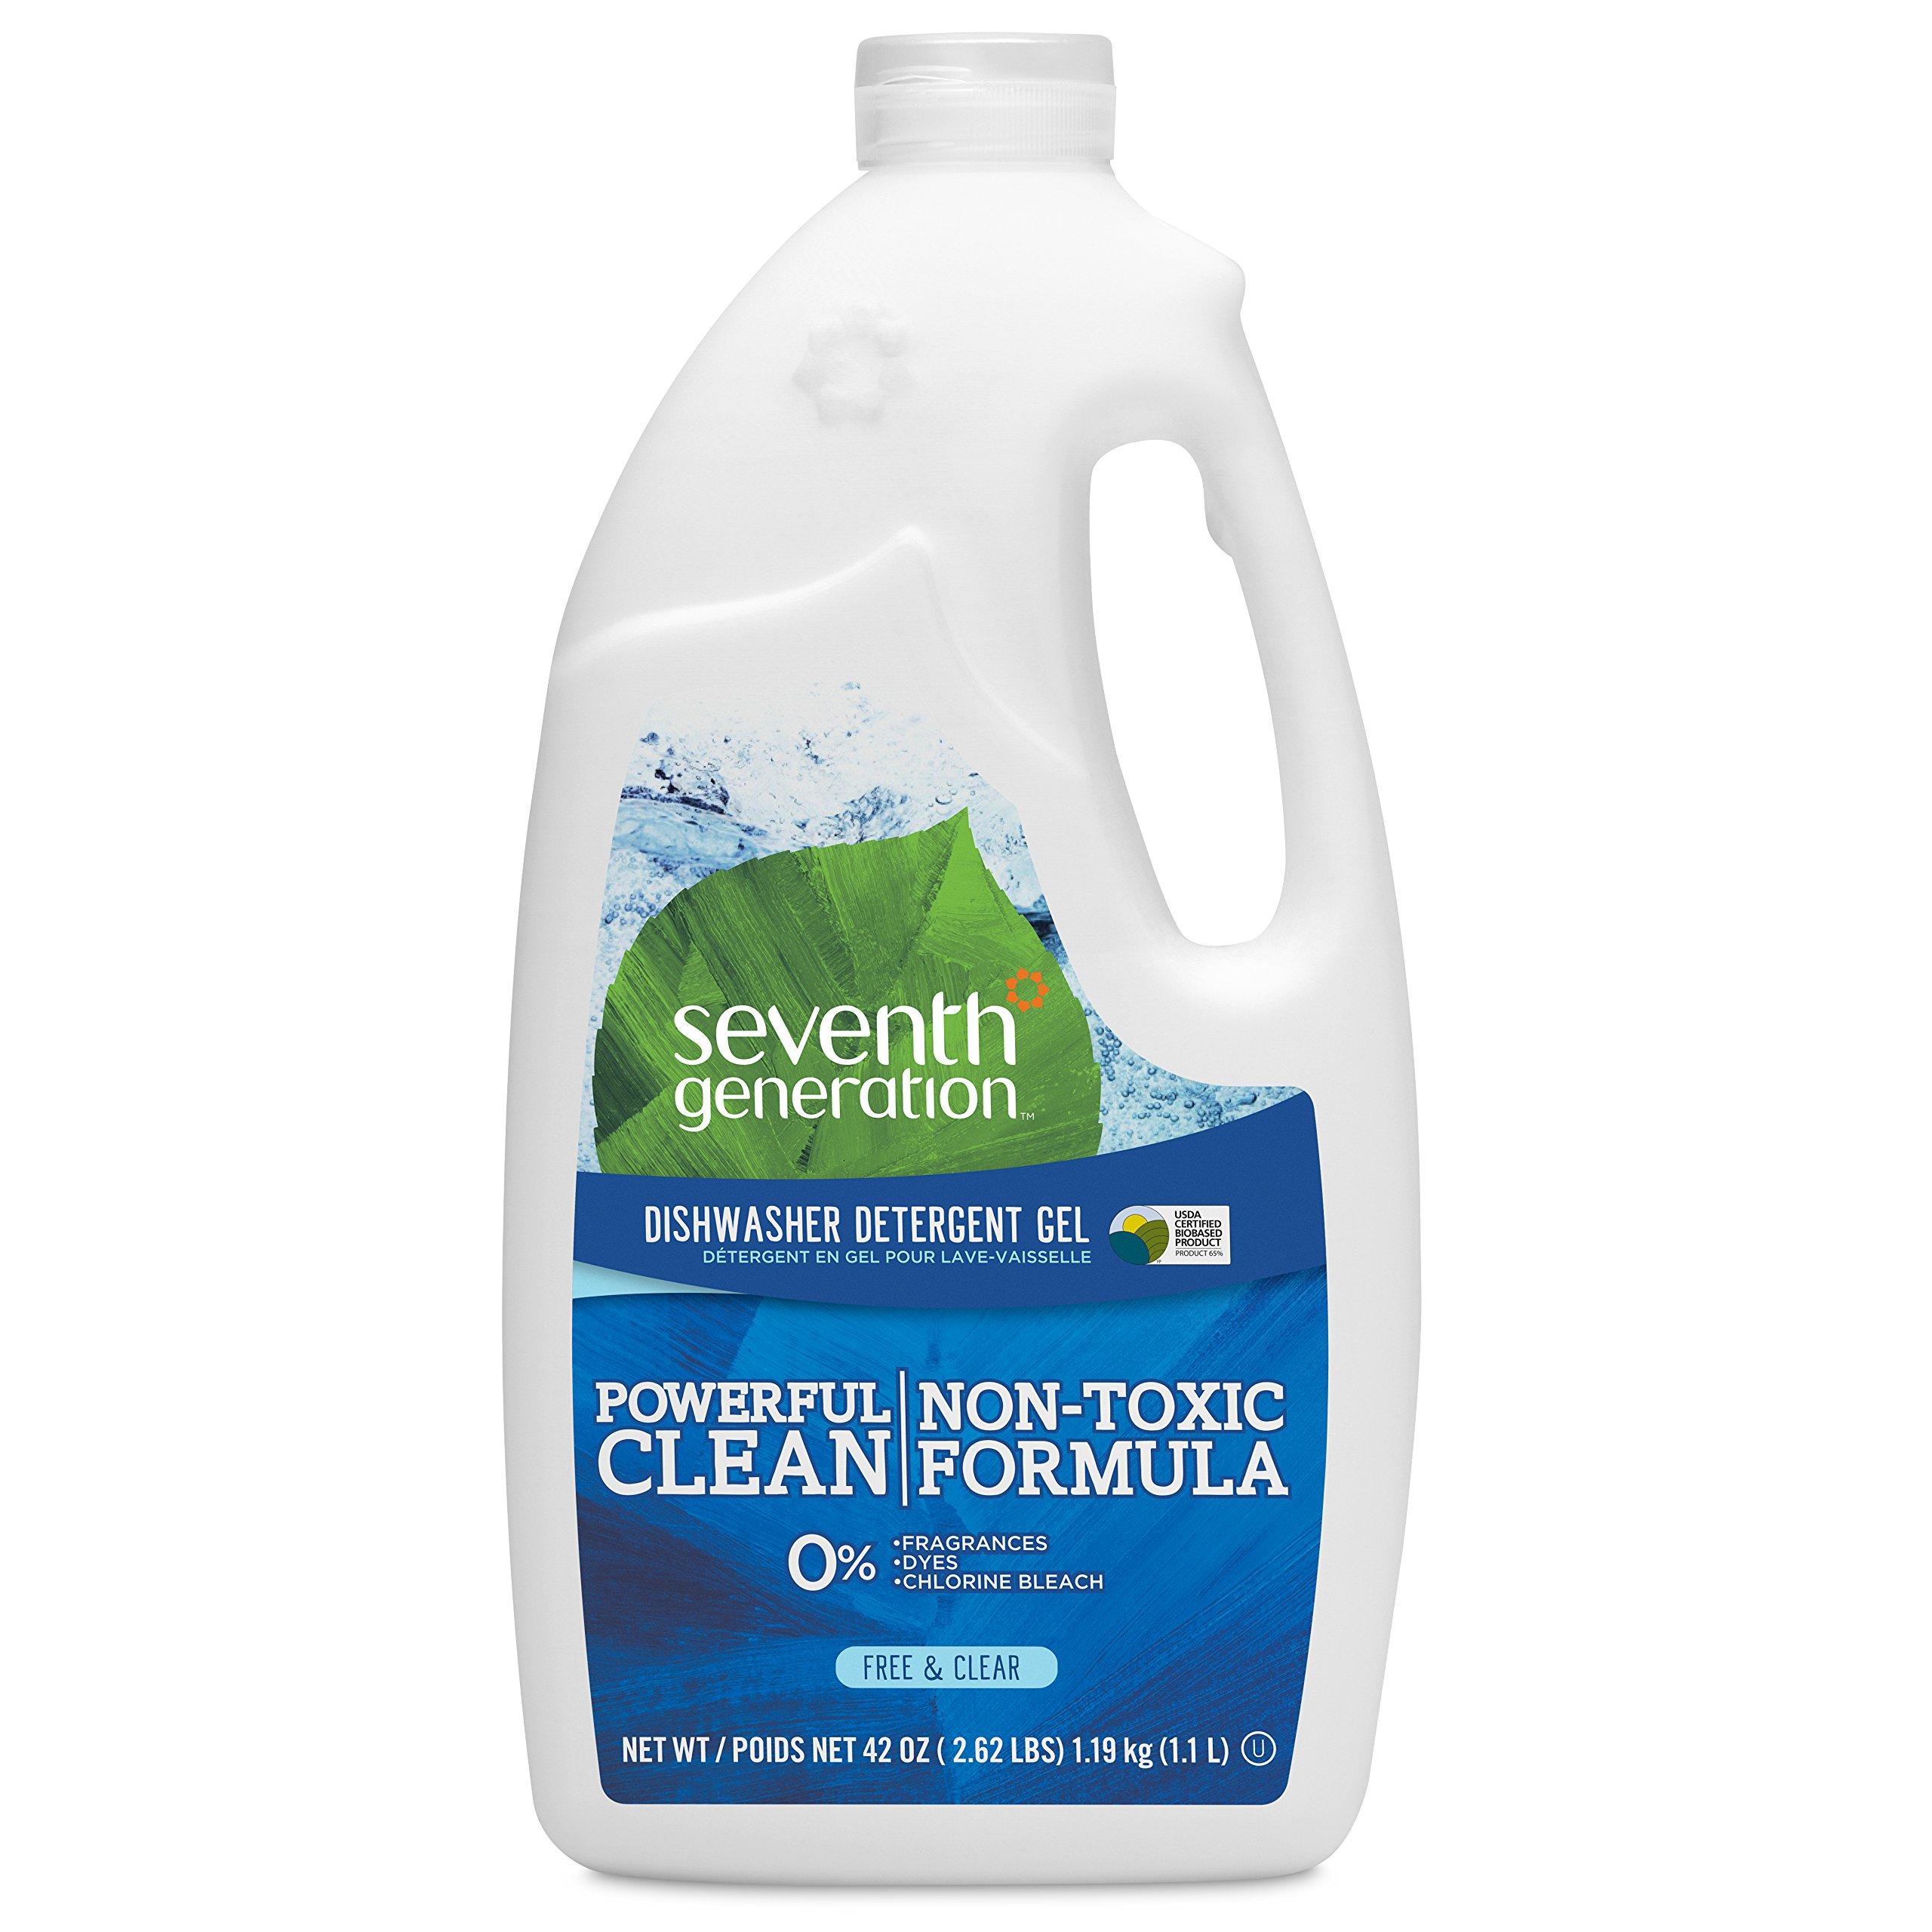 Seventh Generation Dishwasher Detergent Gel, Free & Clear, 42 oz (Pack of 6)